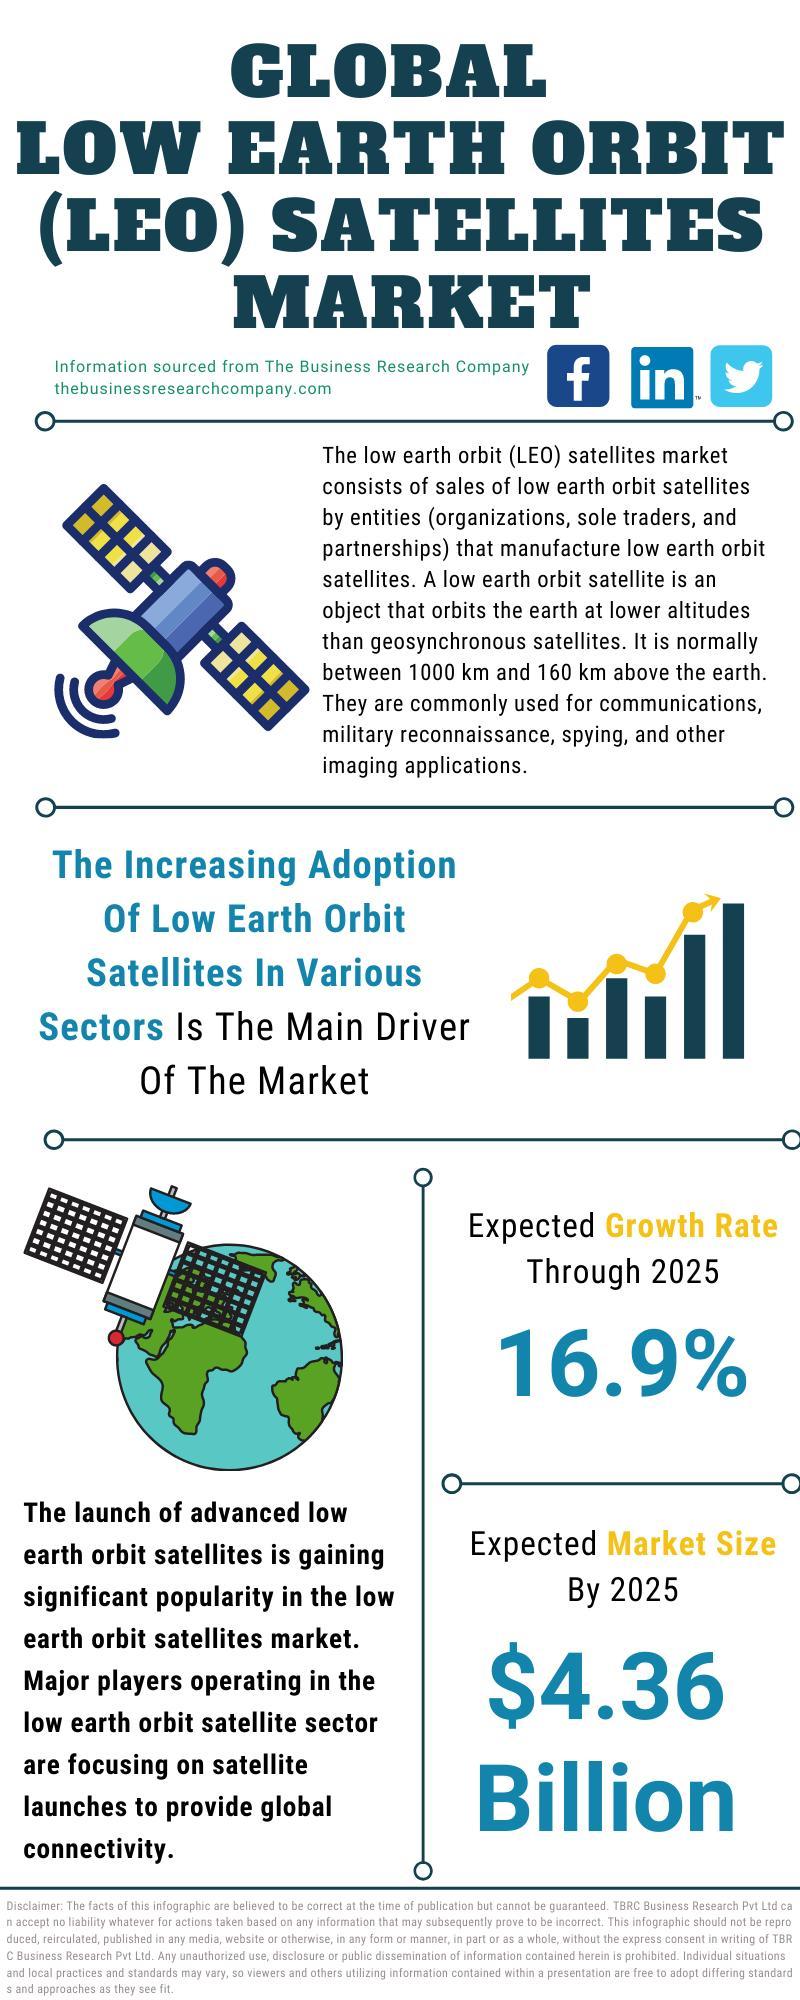 Low Earth Orbit (LEO) Satellites Market